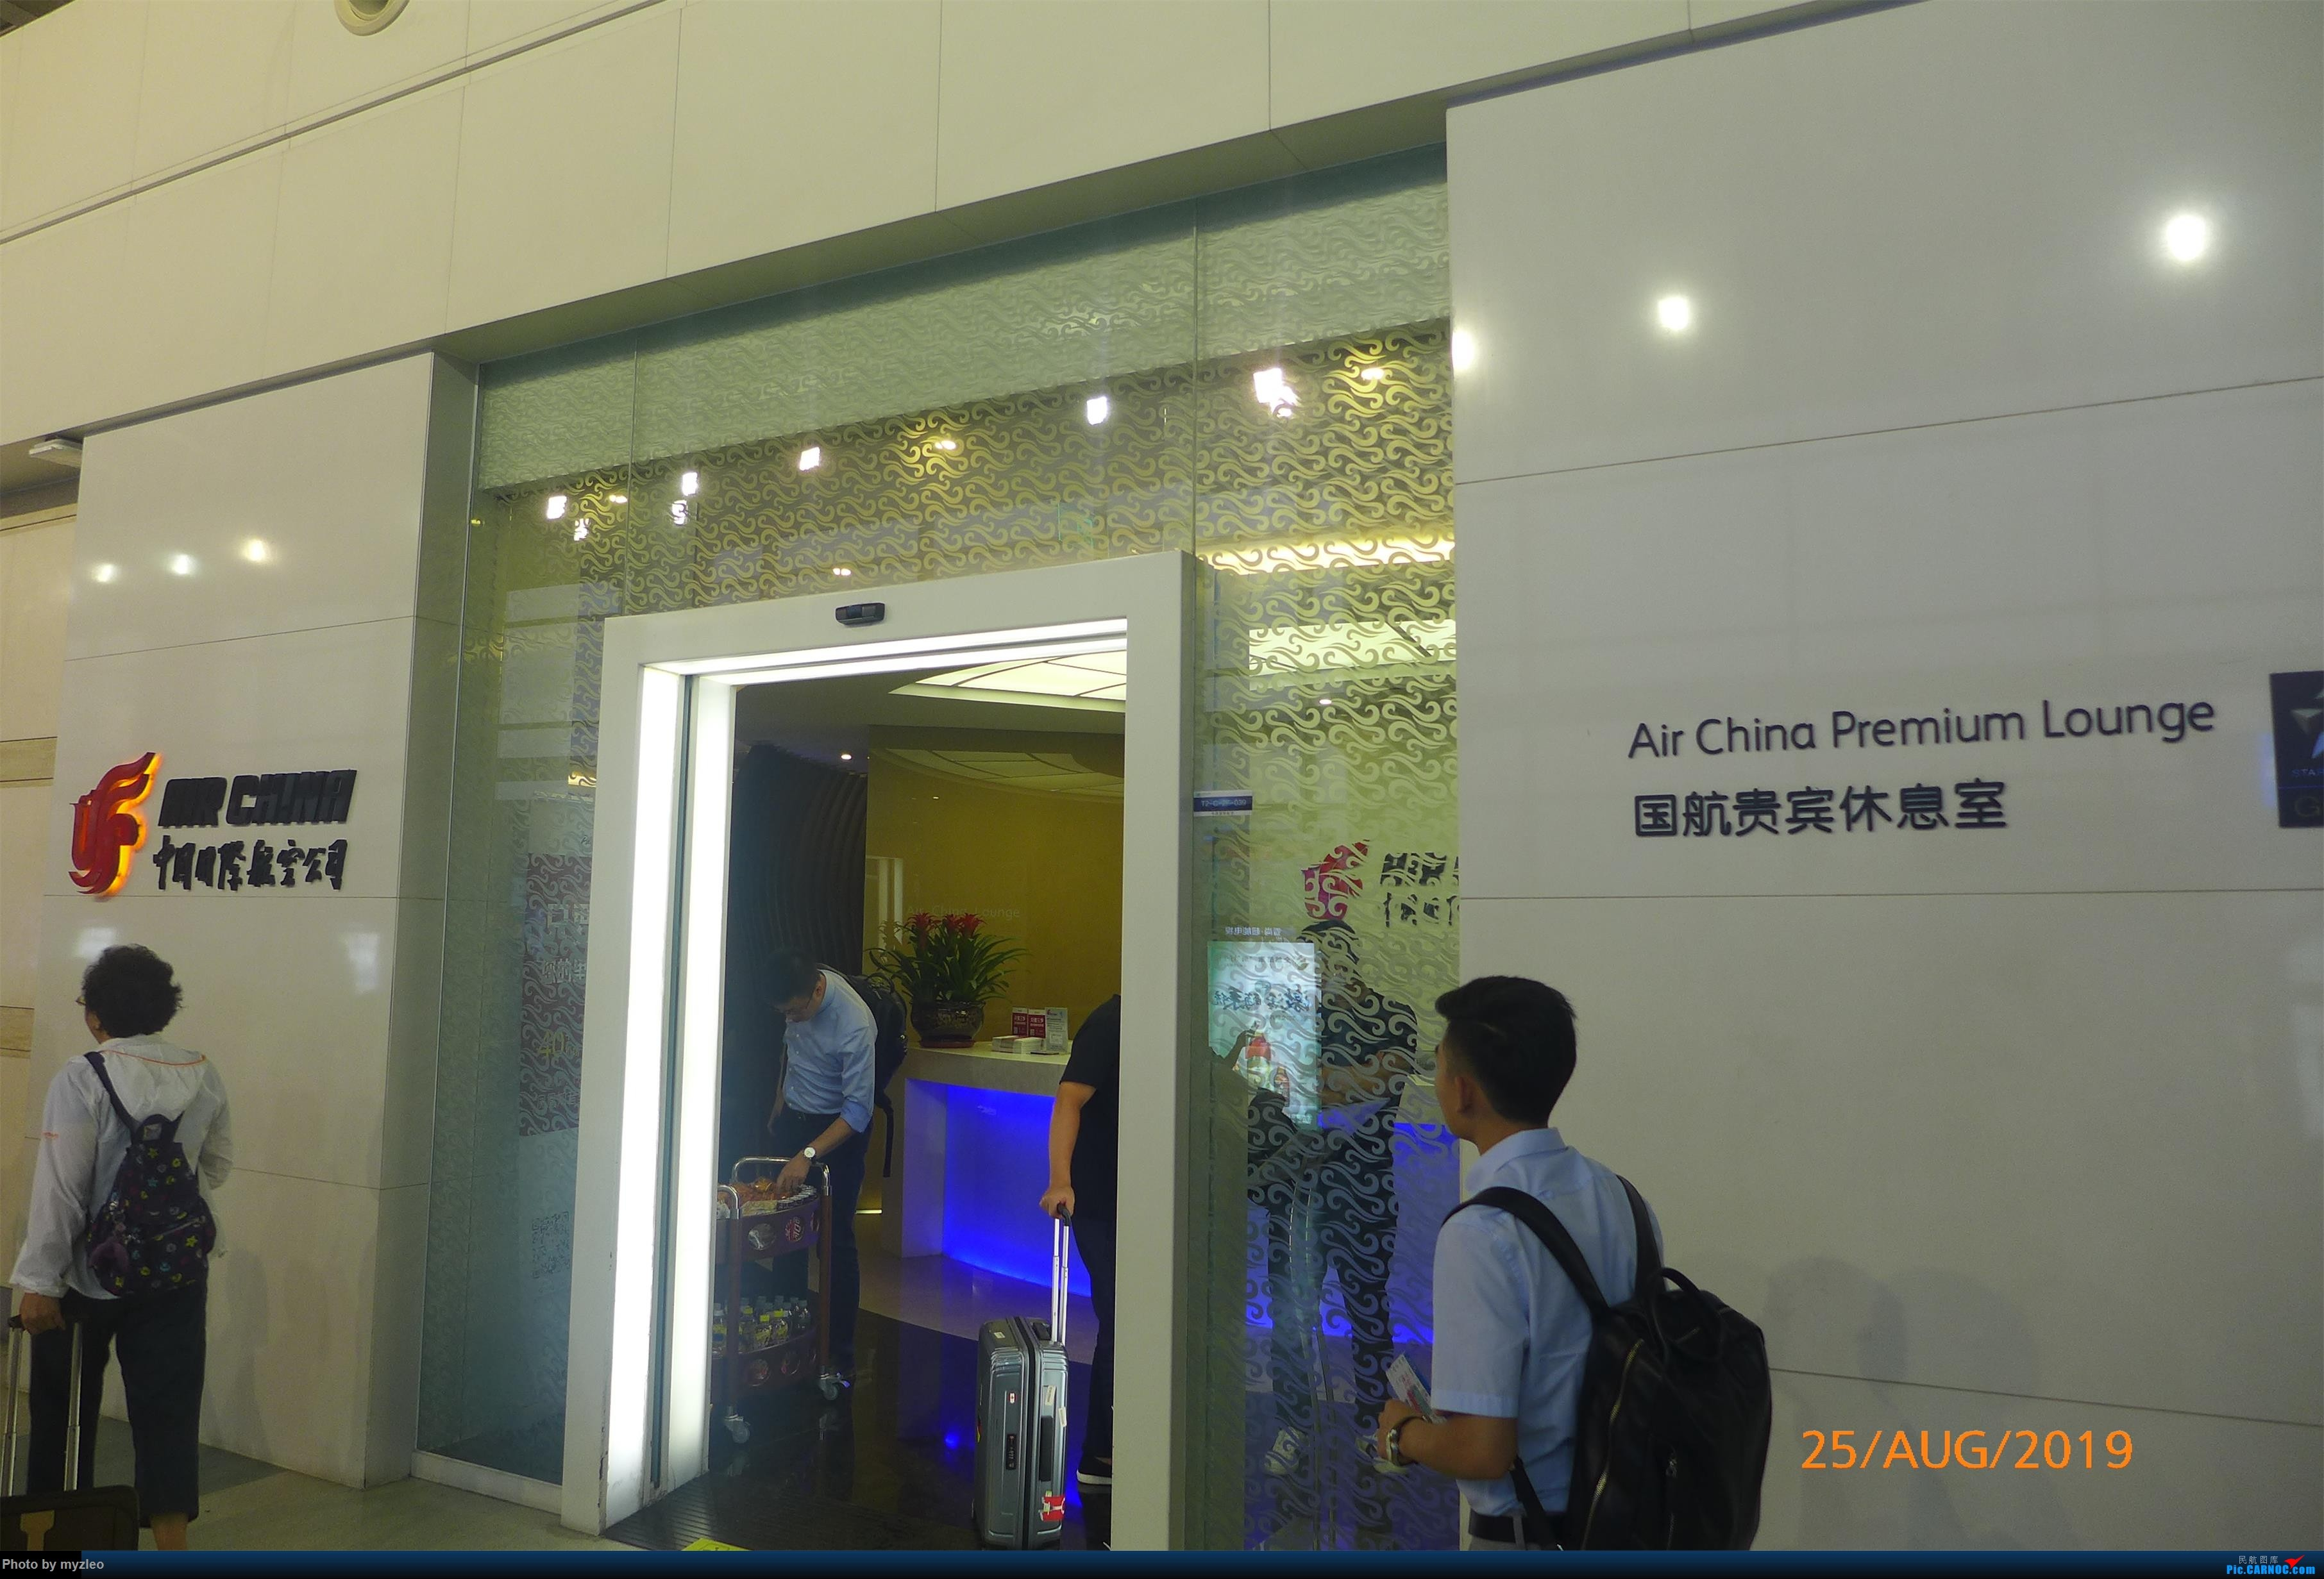 Re:【myzleo的游记5.3】在大连各景点穿梭不停,坐东航319返回上海 AIRBUS A319-100 B-6439 中国大连国际机场 中国大连国际机场